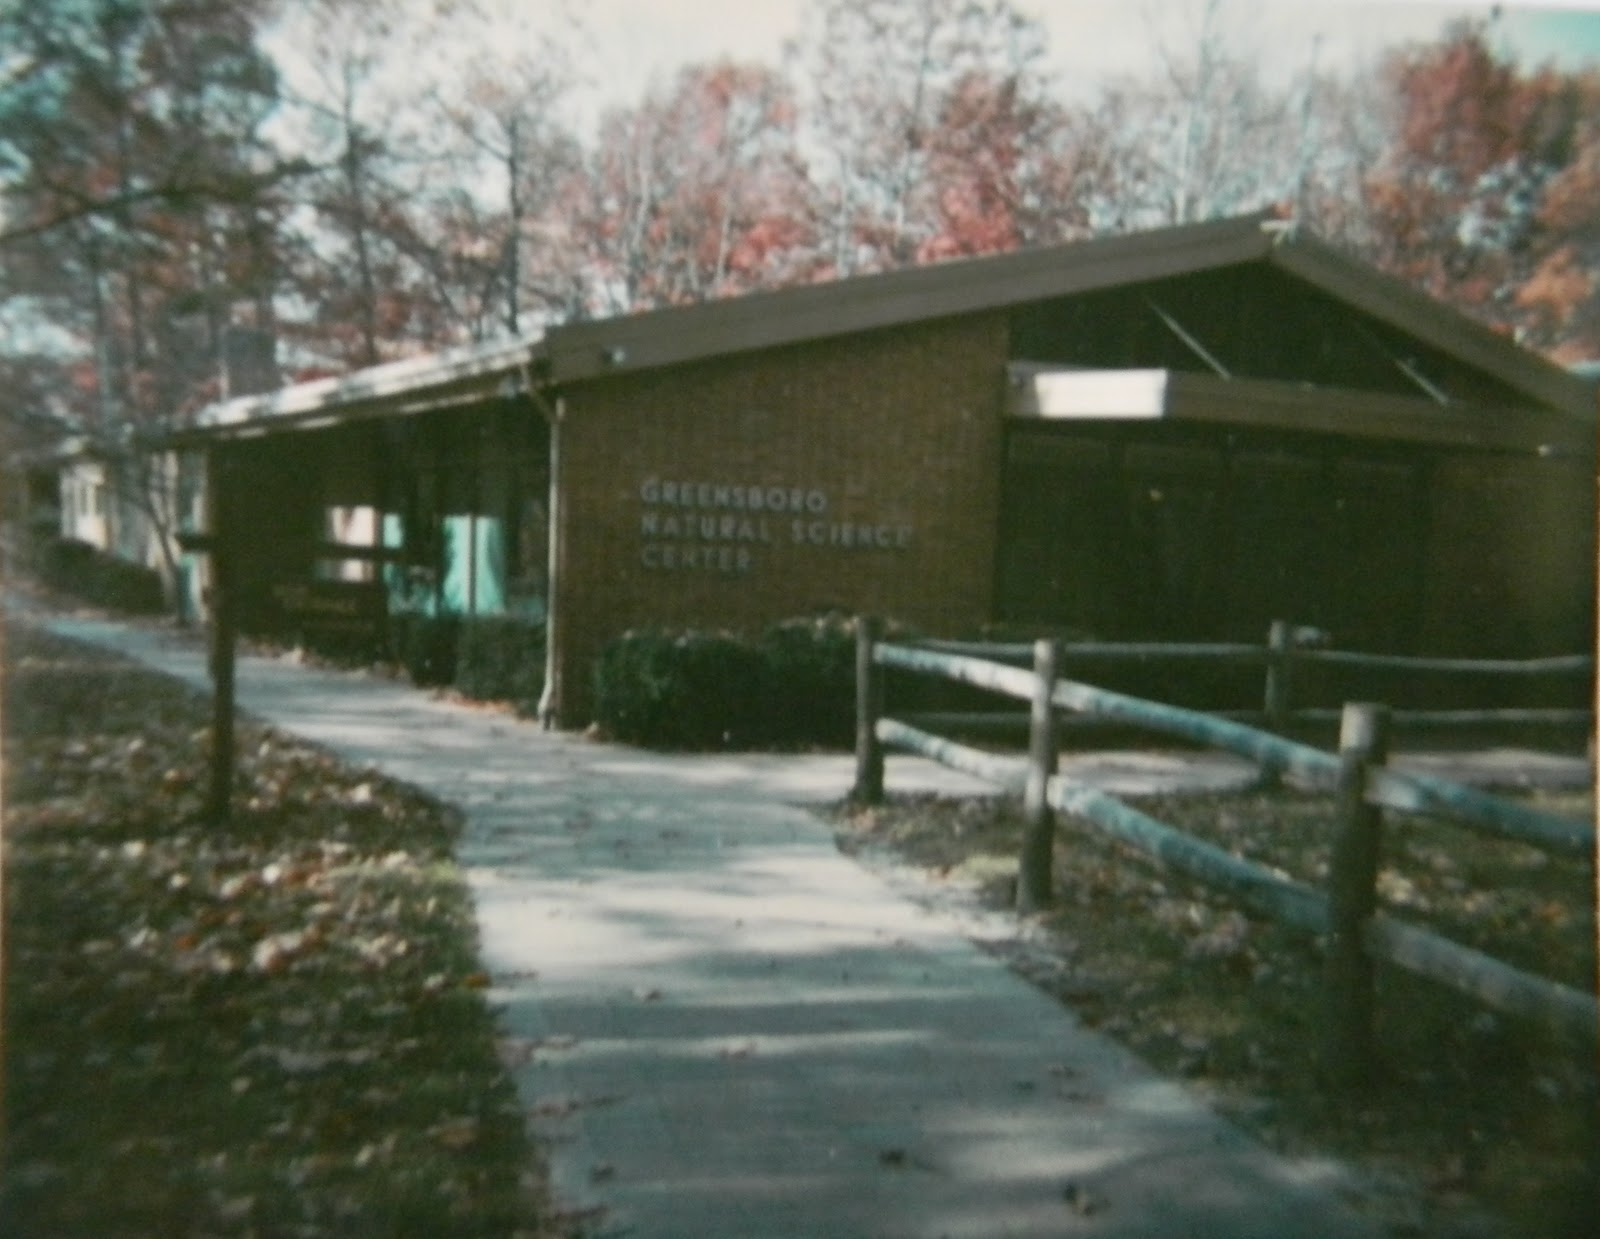 Natural Science Center Greensboro Volunteer